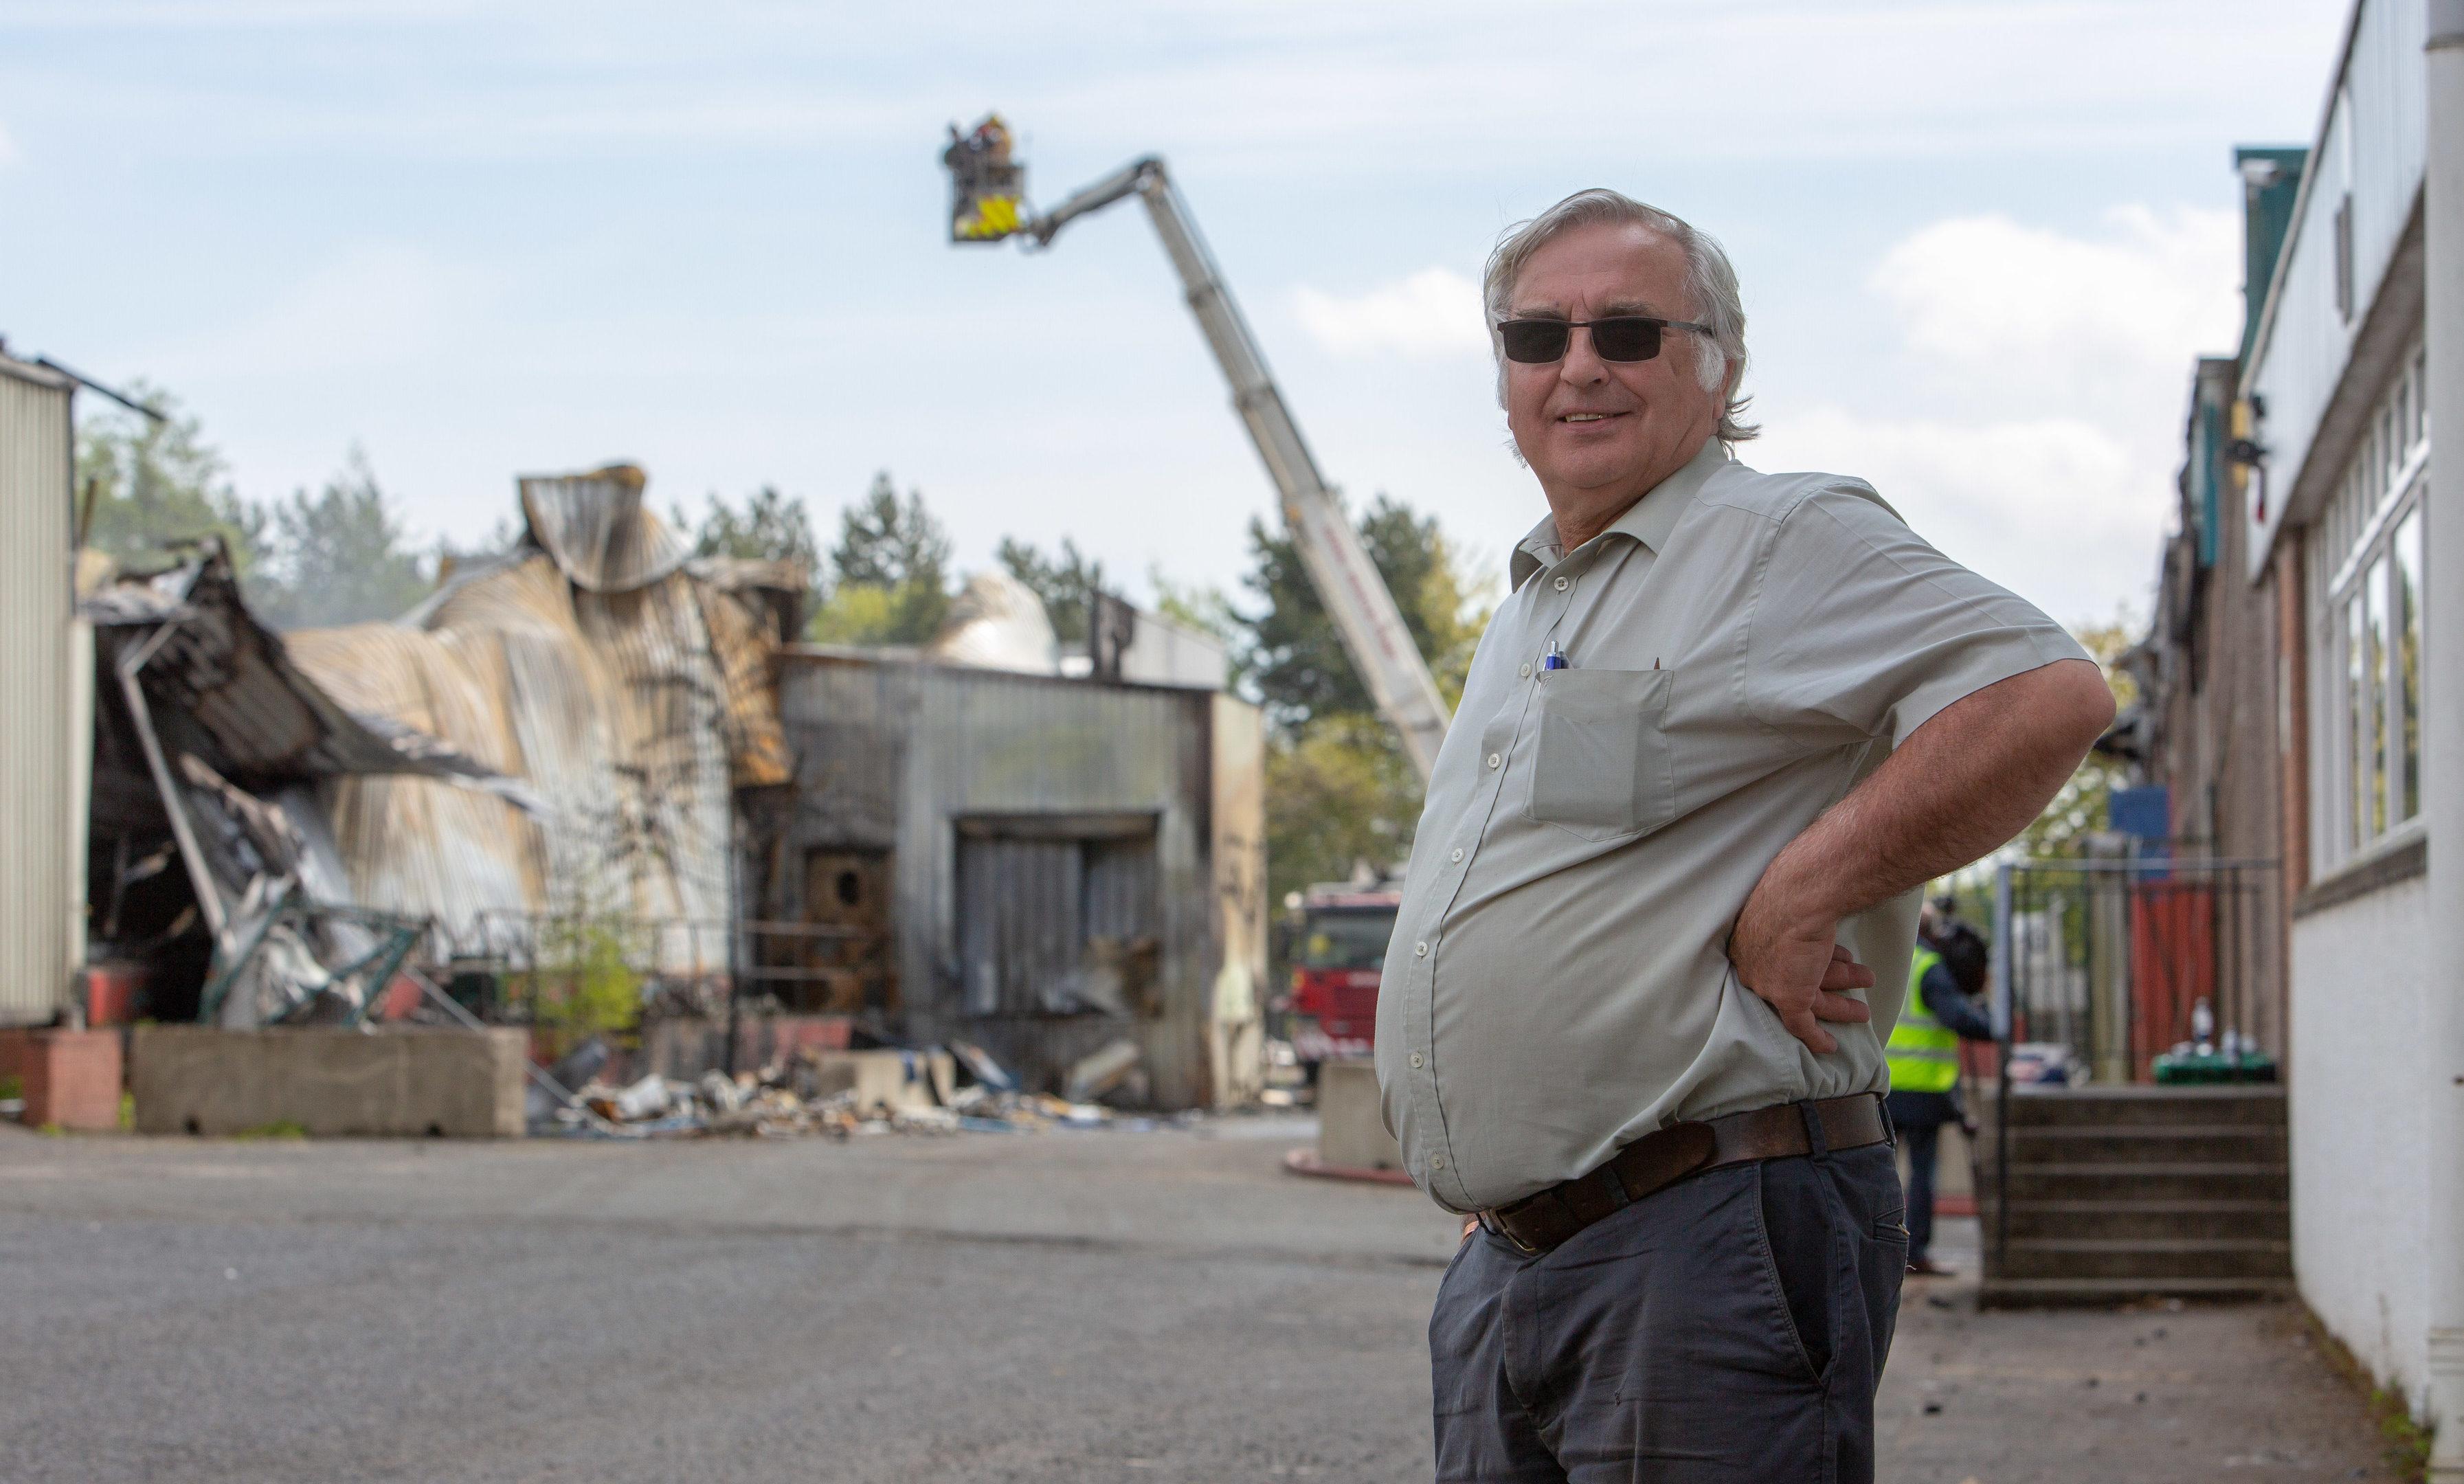 Mr Peebles surveys the devastation